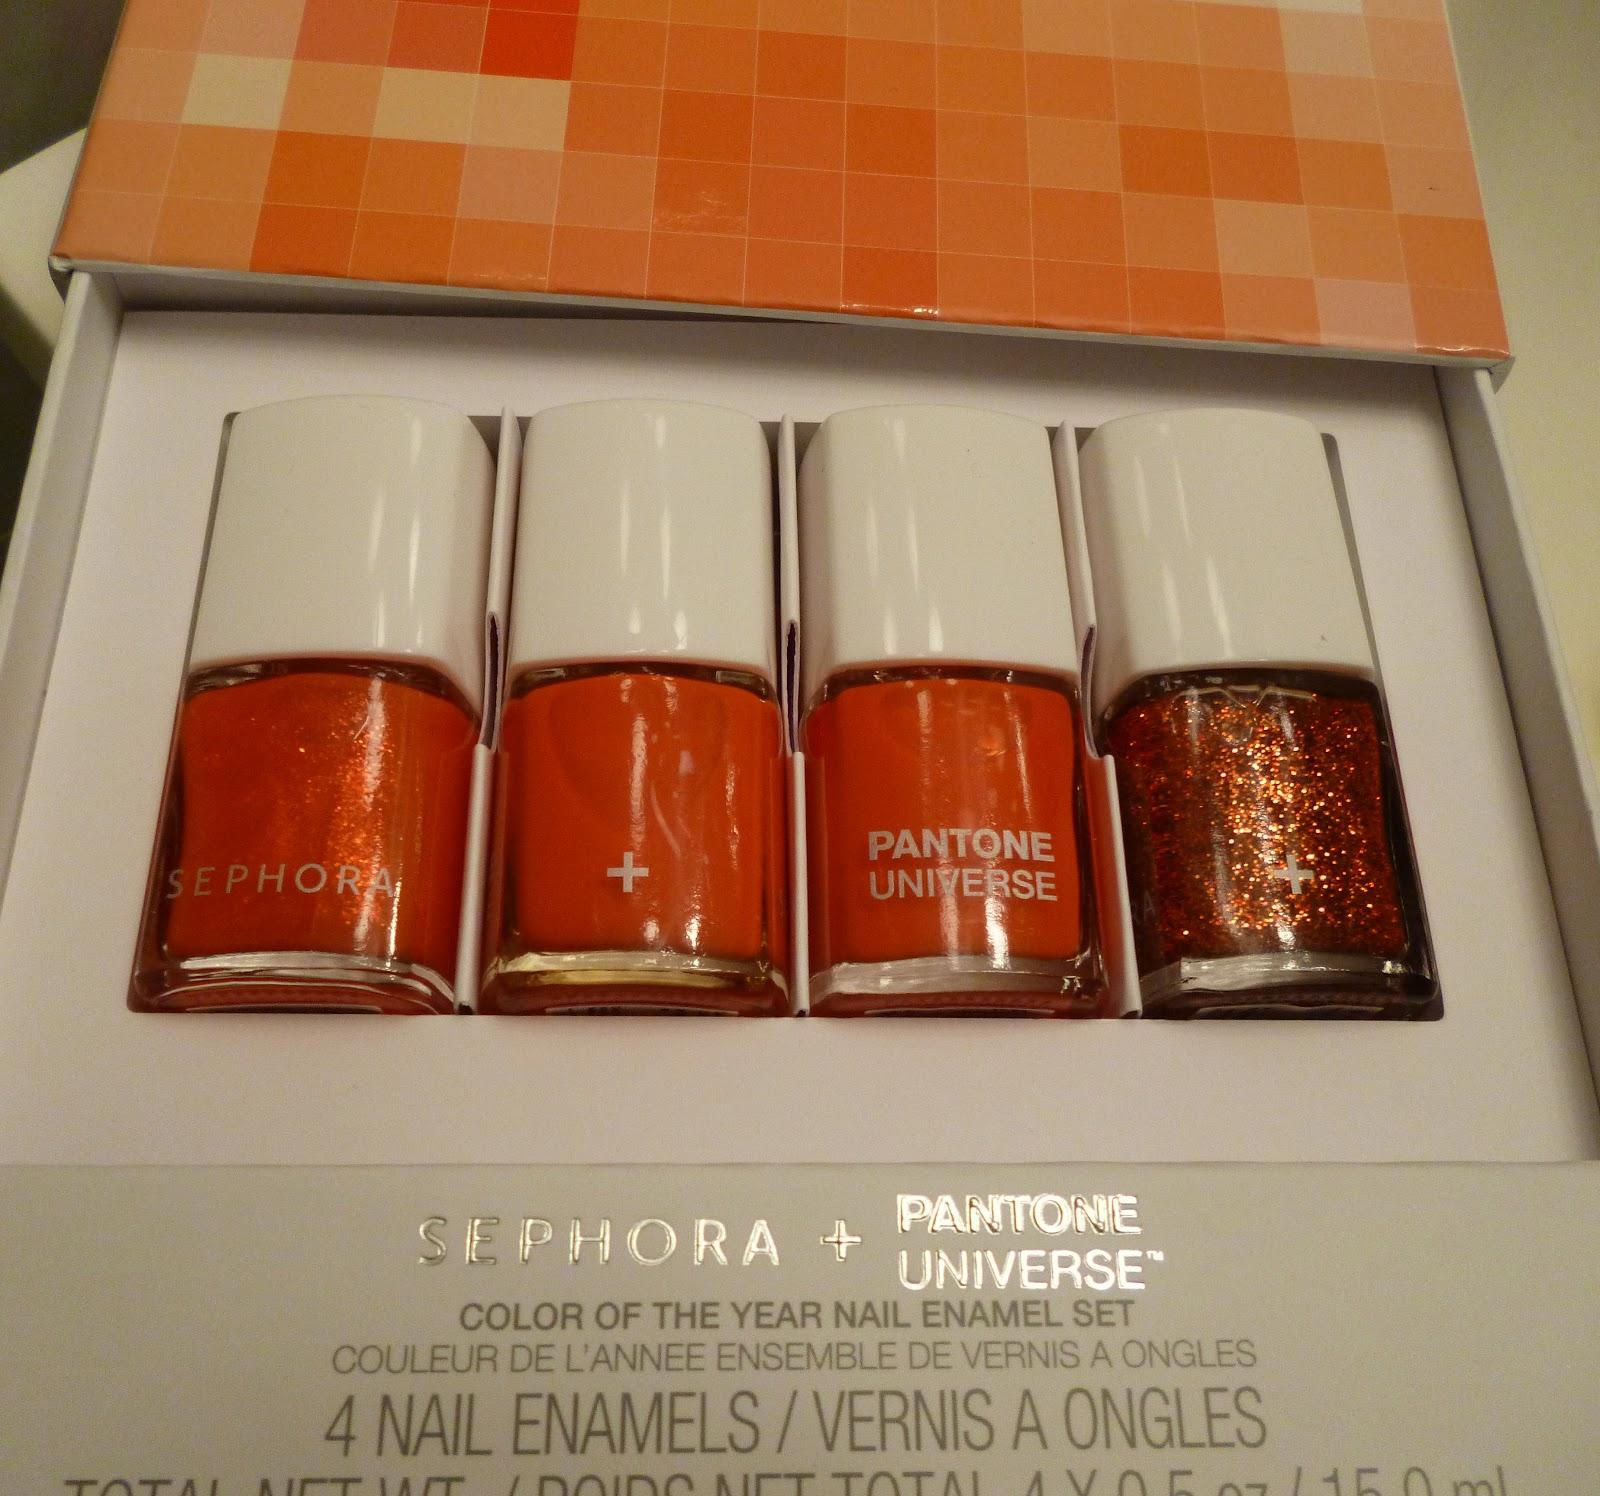 Petite in the City: Sephora + Pantone Tangerine Tango Nail Polish ...